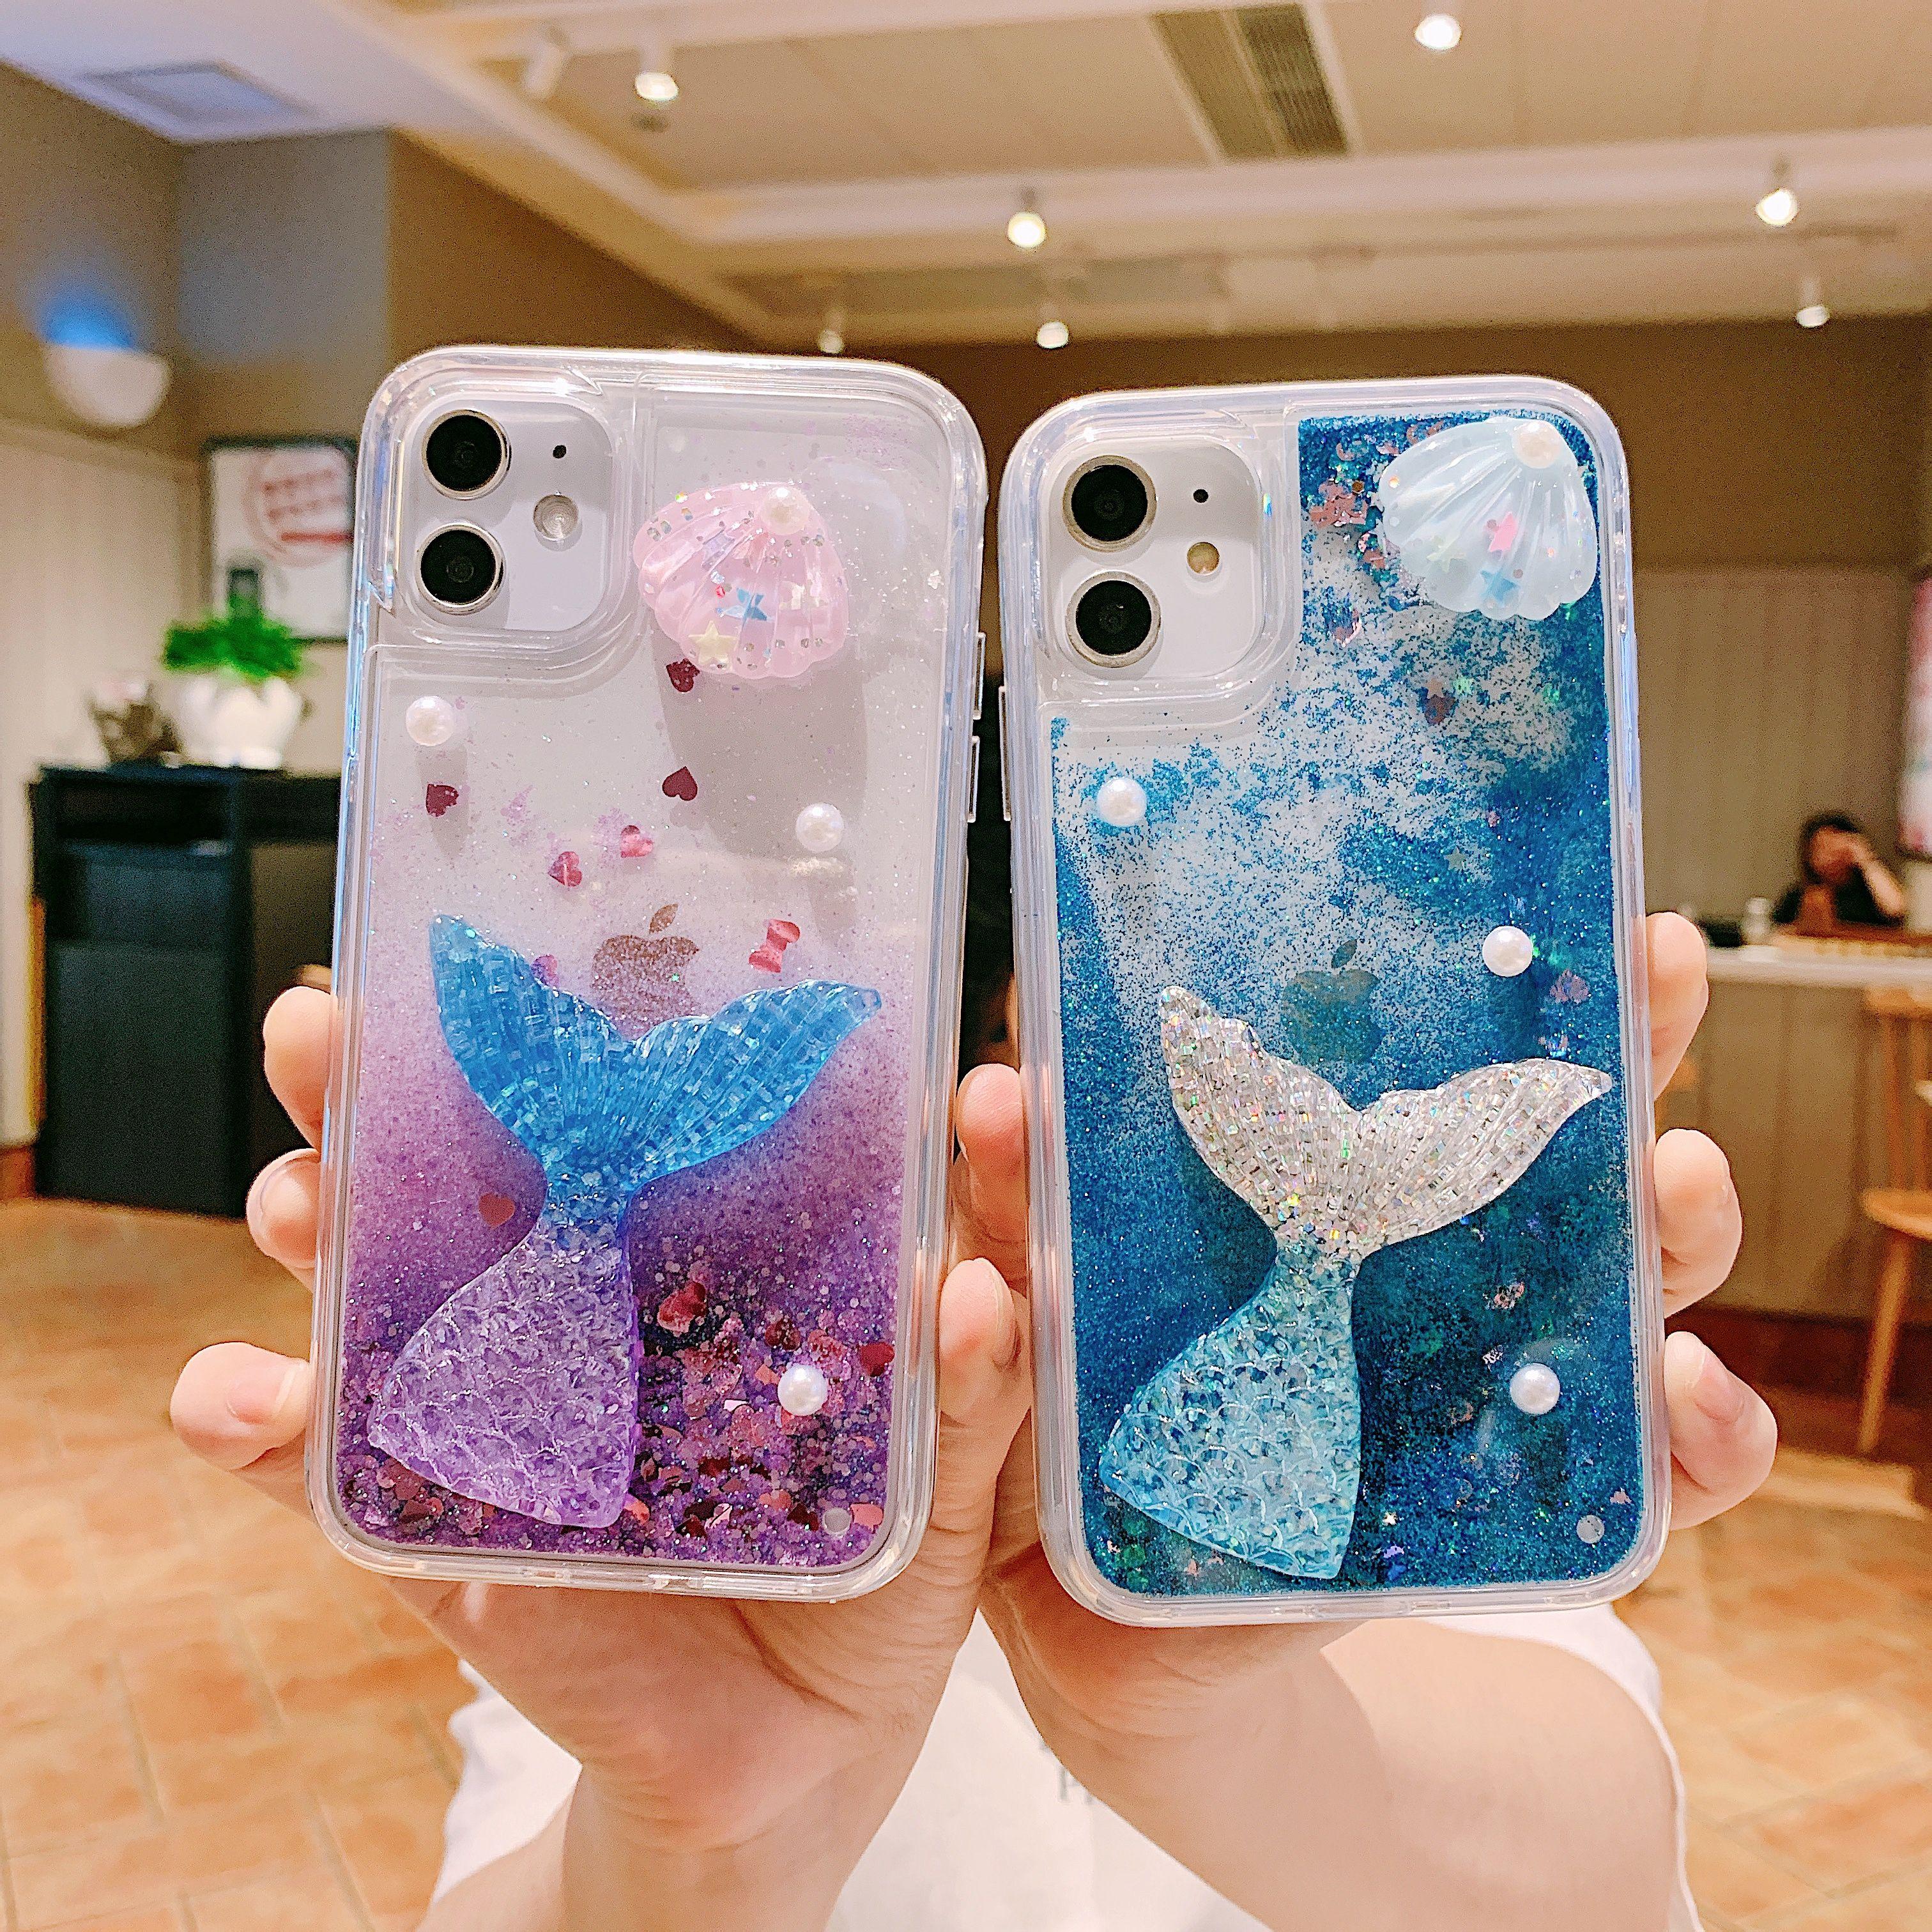 Glitter Bling Mermaid Liquid Quicksand Phone Case For iPhone 11 Pro Max XS Max XR X 8 7 6s 6 Plus Starfish Cover